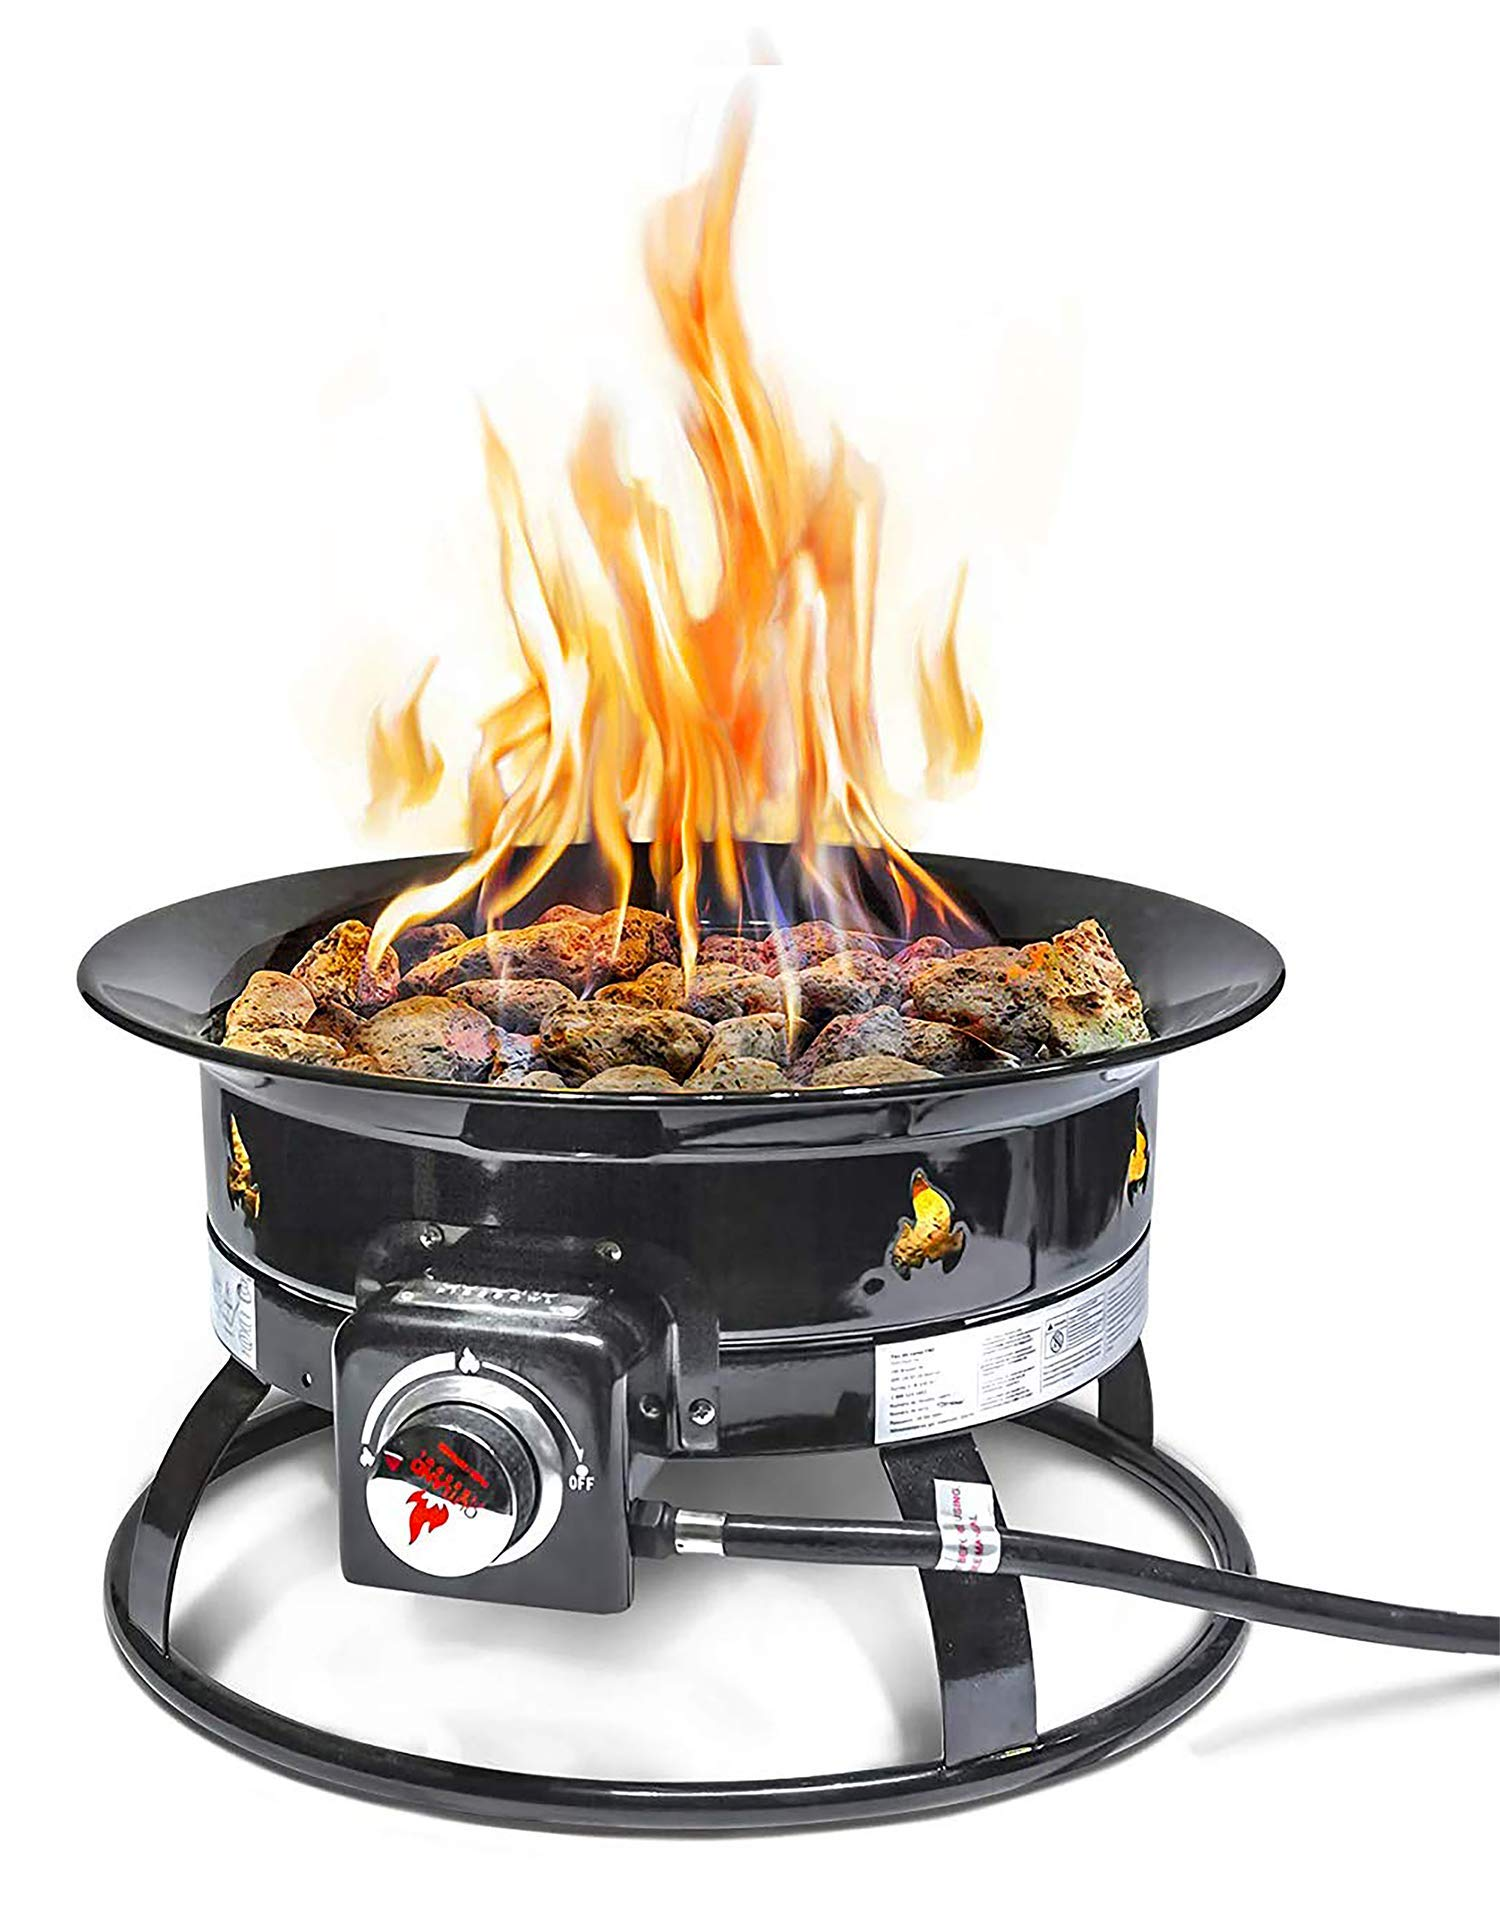 Outland Firebowl 823 Outdoor Portable Propane Gas Fire Pit, 19-Inch Diameter 58,000 BTU by Outland Living